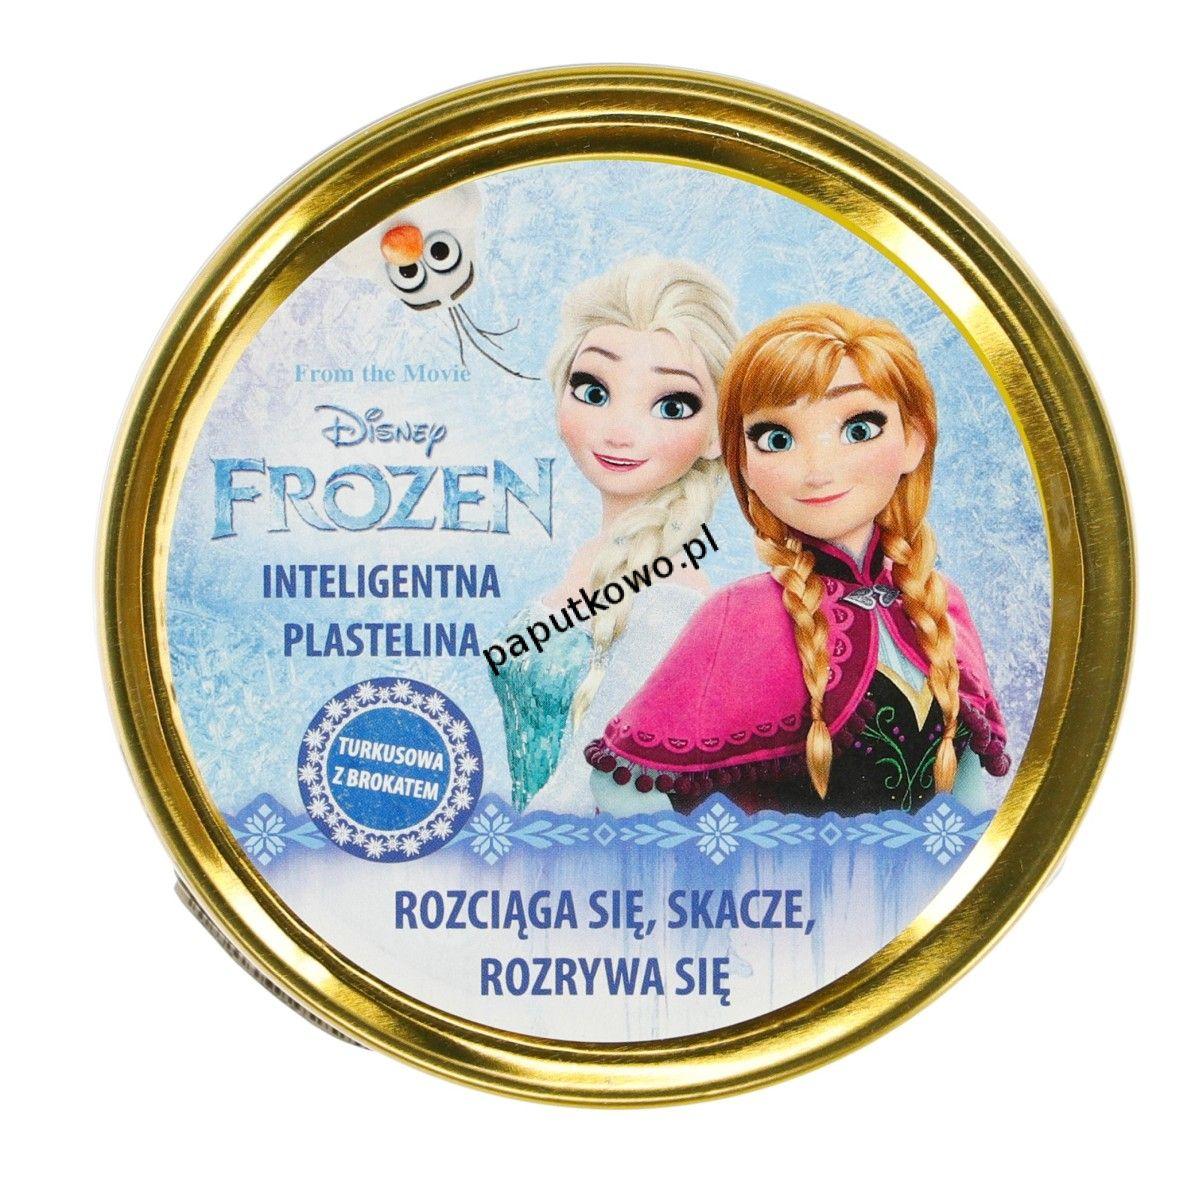 Plastelina Astra 1 kol. Disney Frozen turkusowy